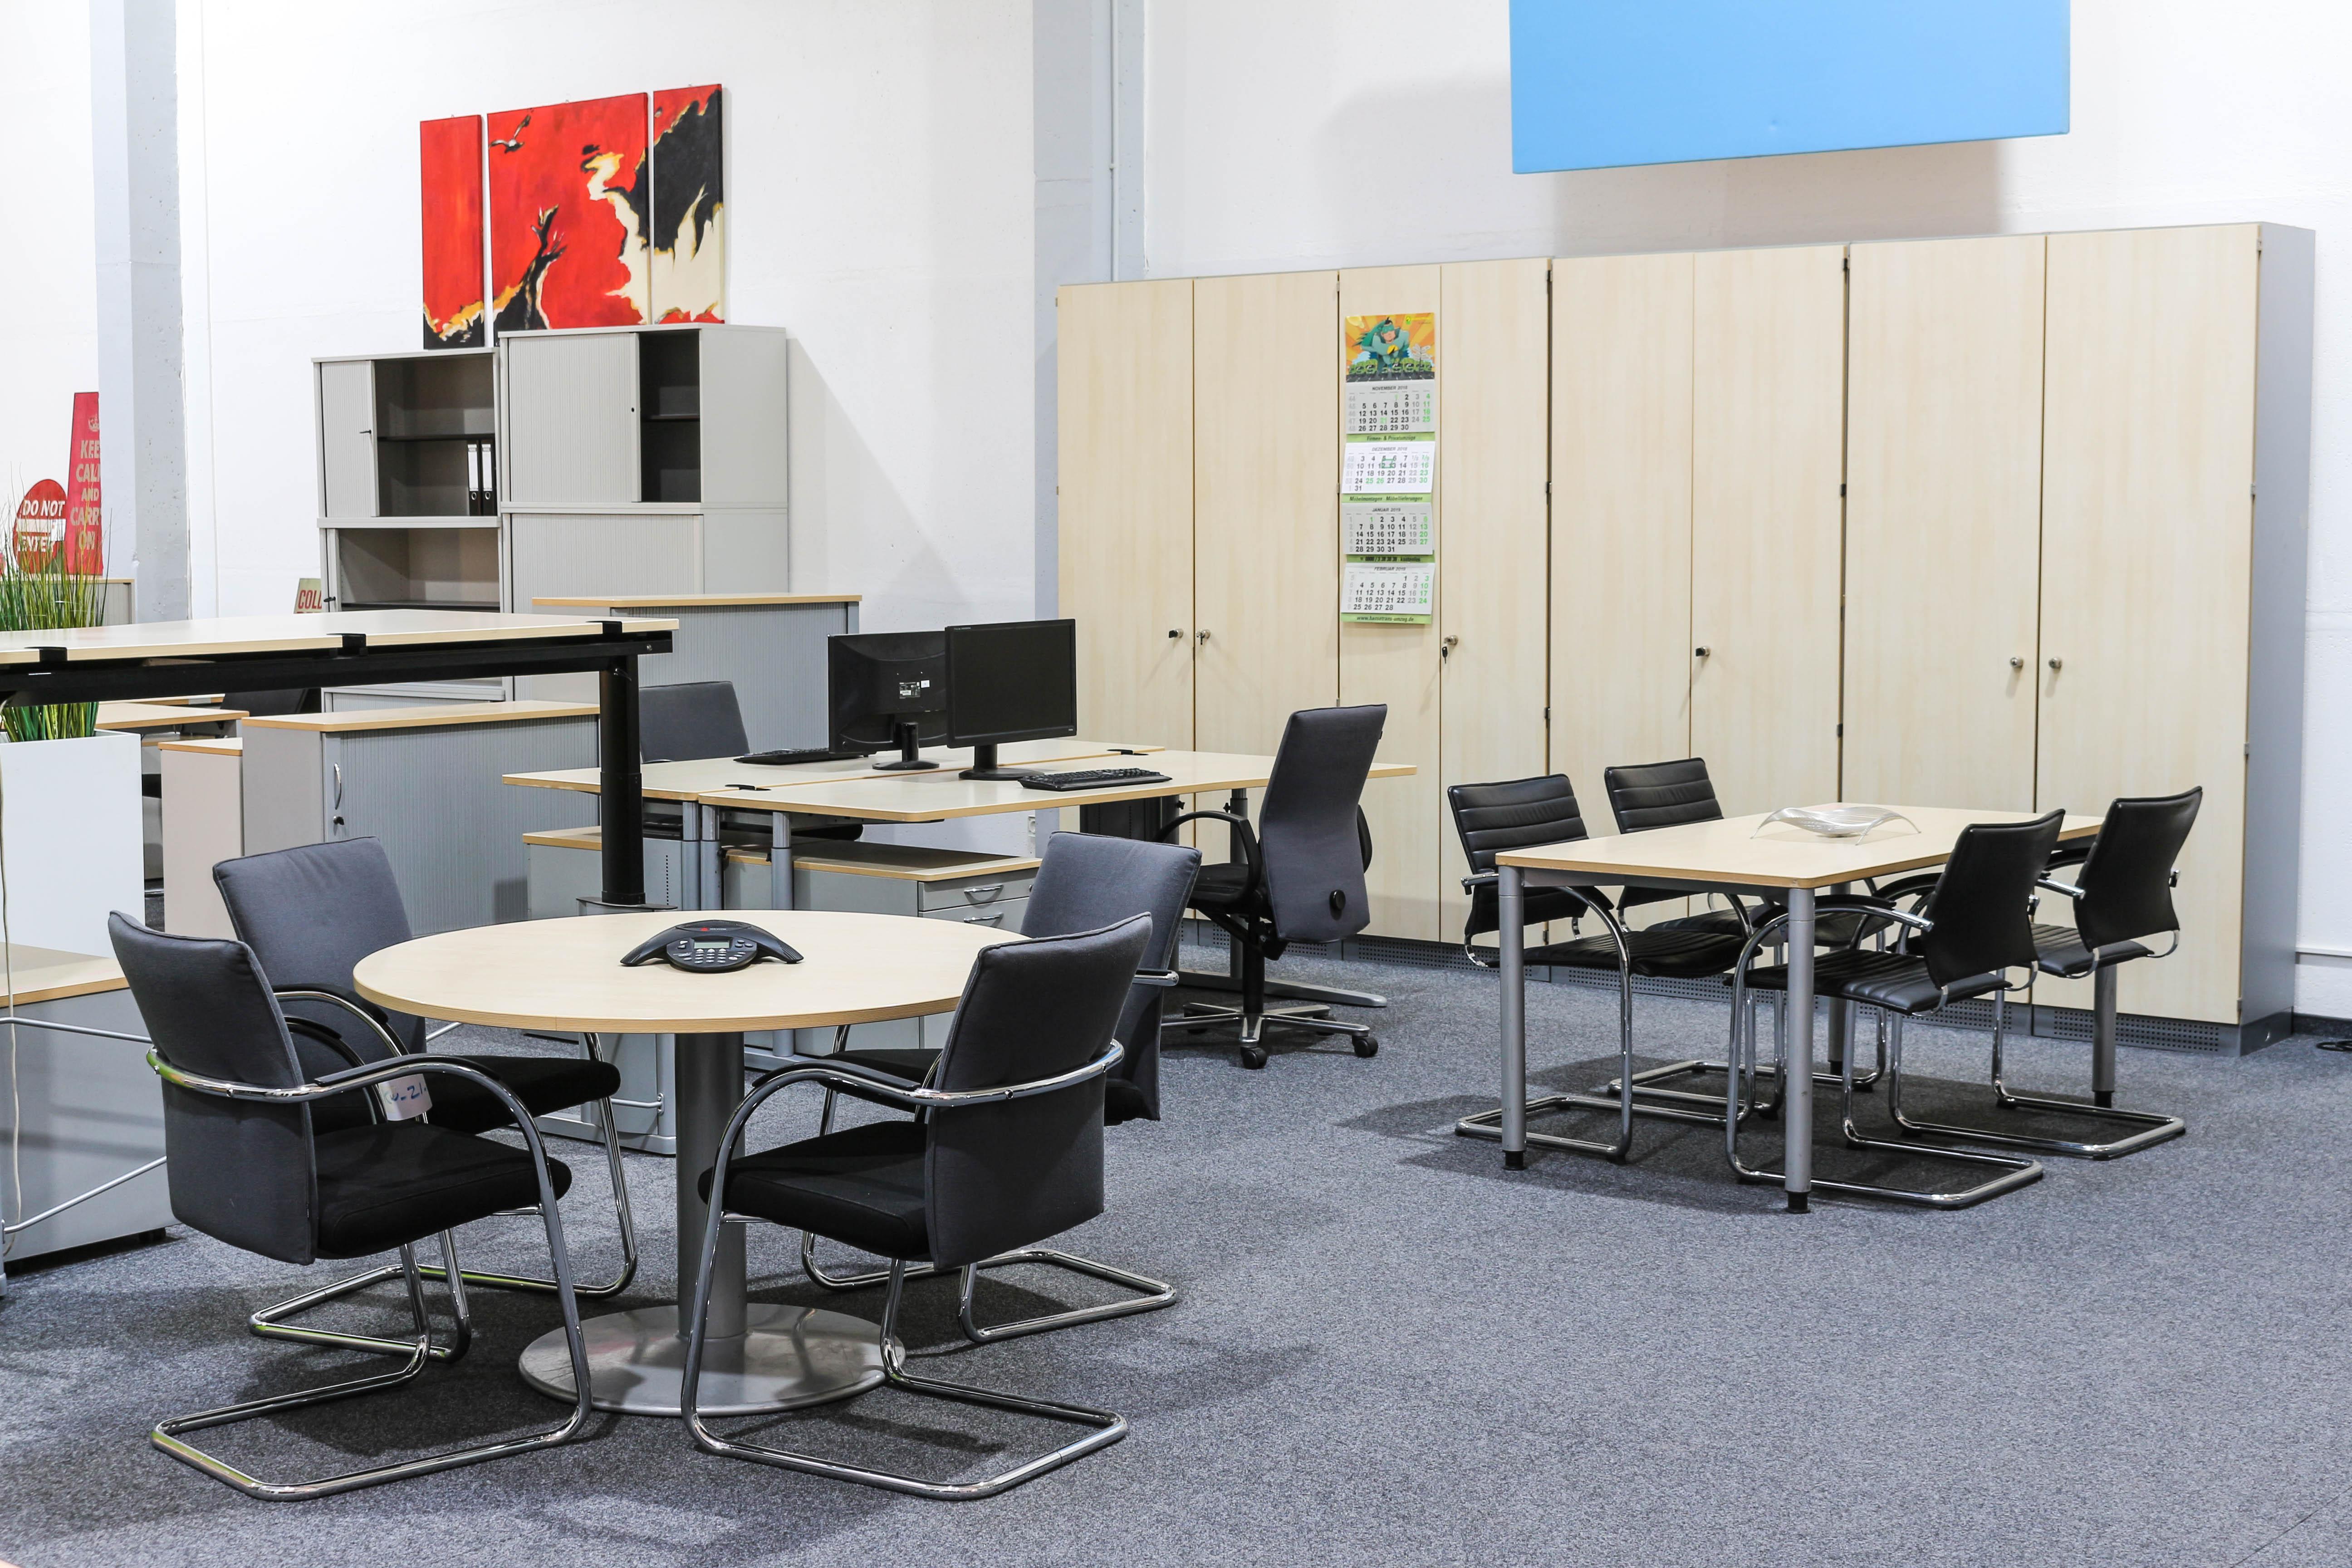 Showroom am Büromöbel Standort Mühlenbeck bei Berlin - 2